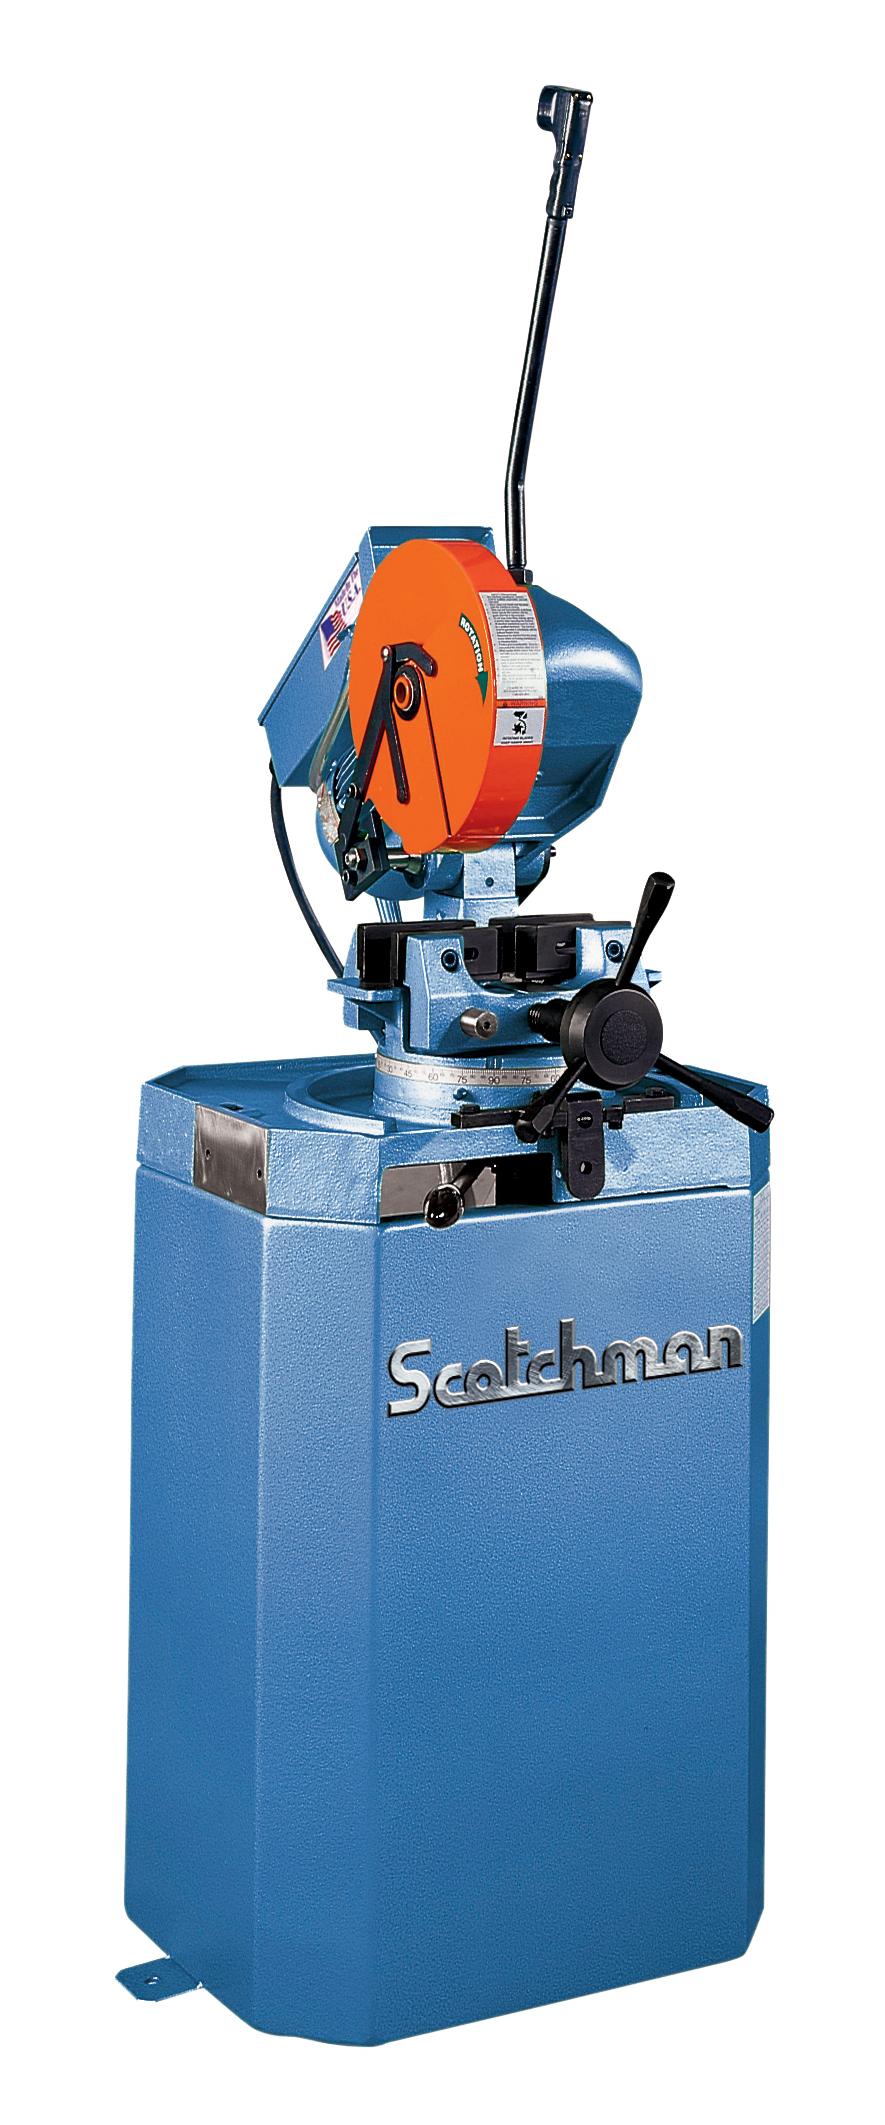 Scotchman CPO 275